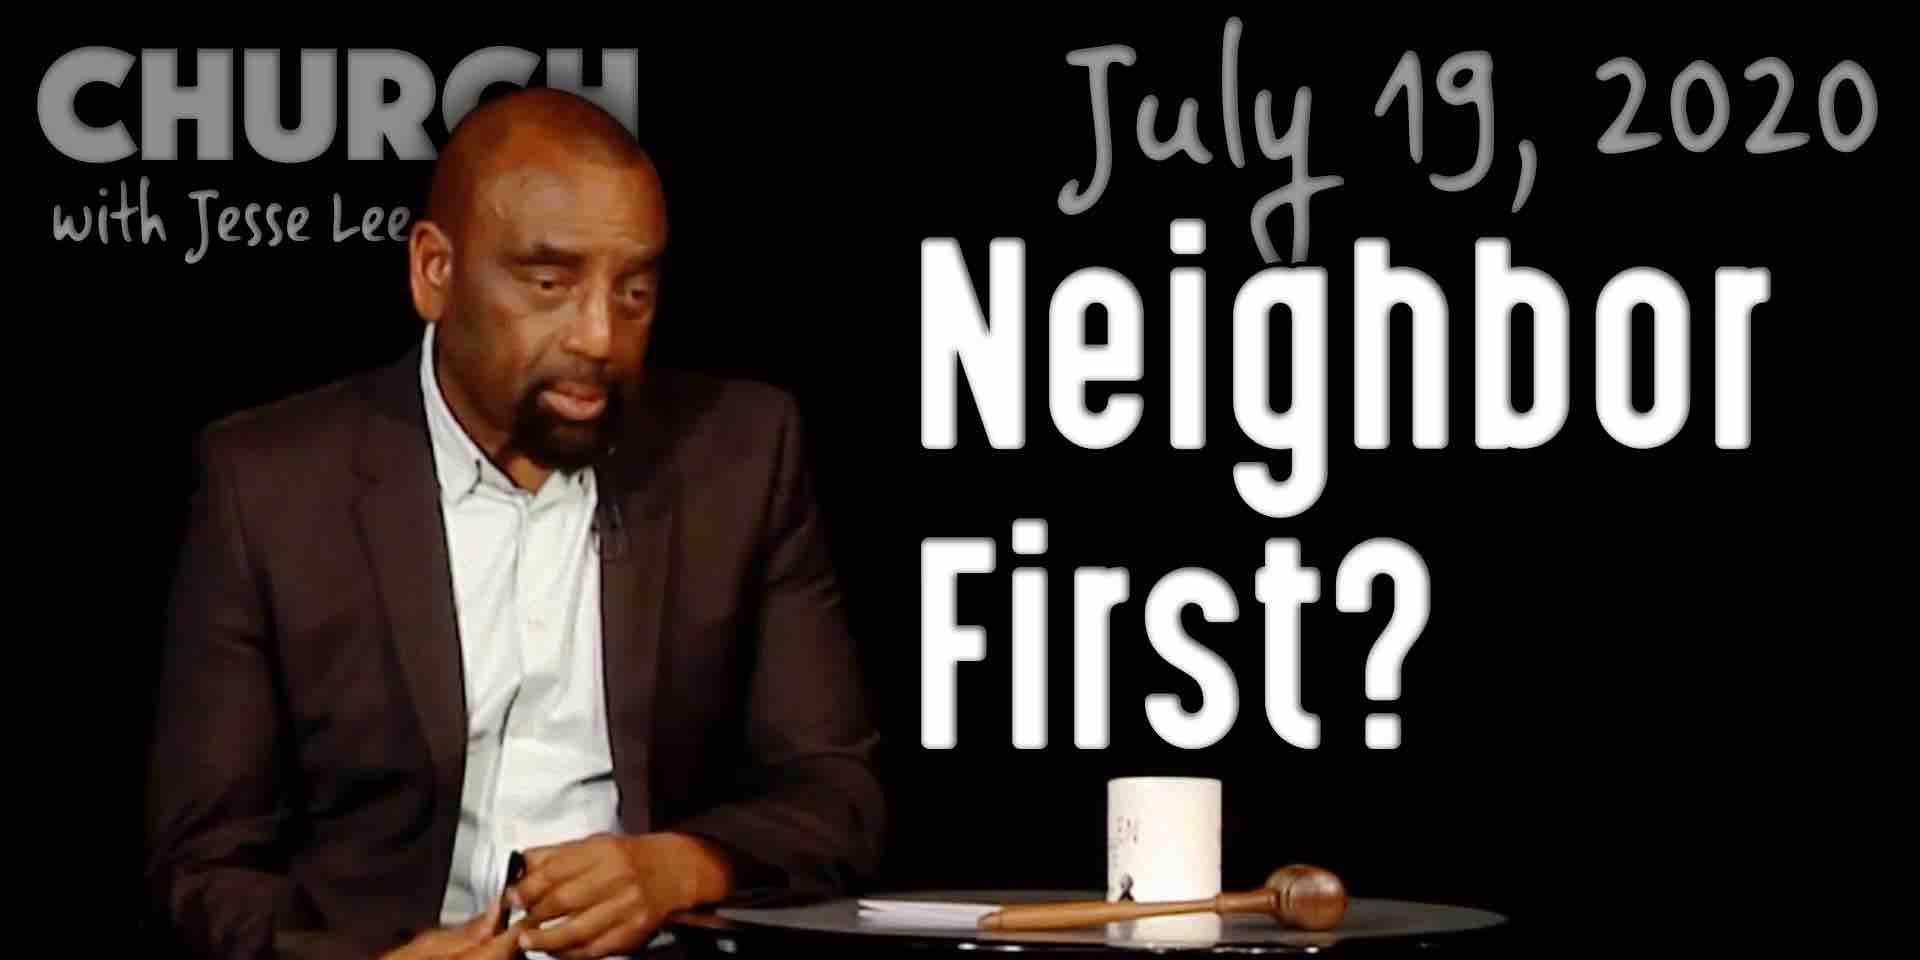 Neighbor First? (Church 7/19/20)